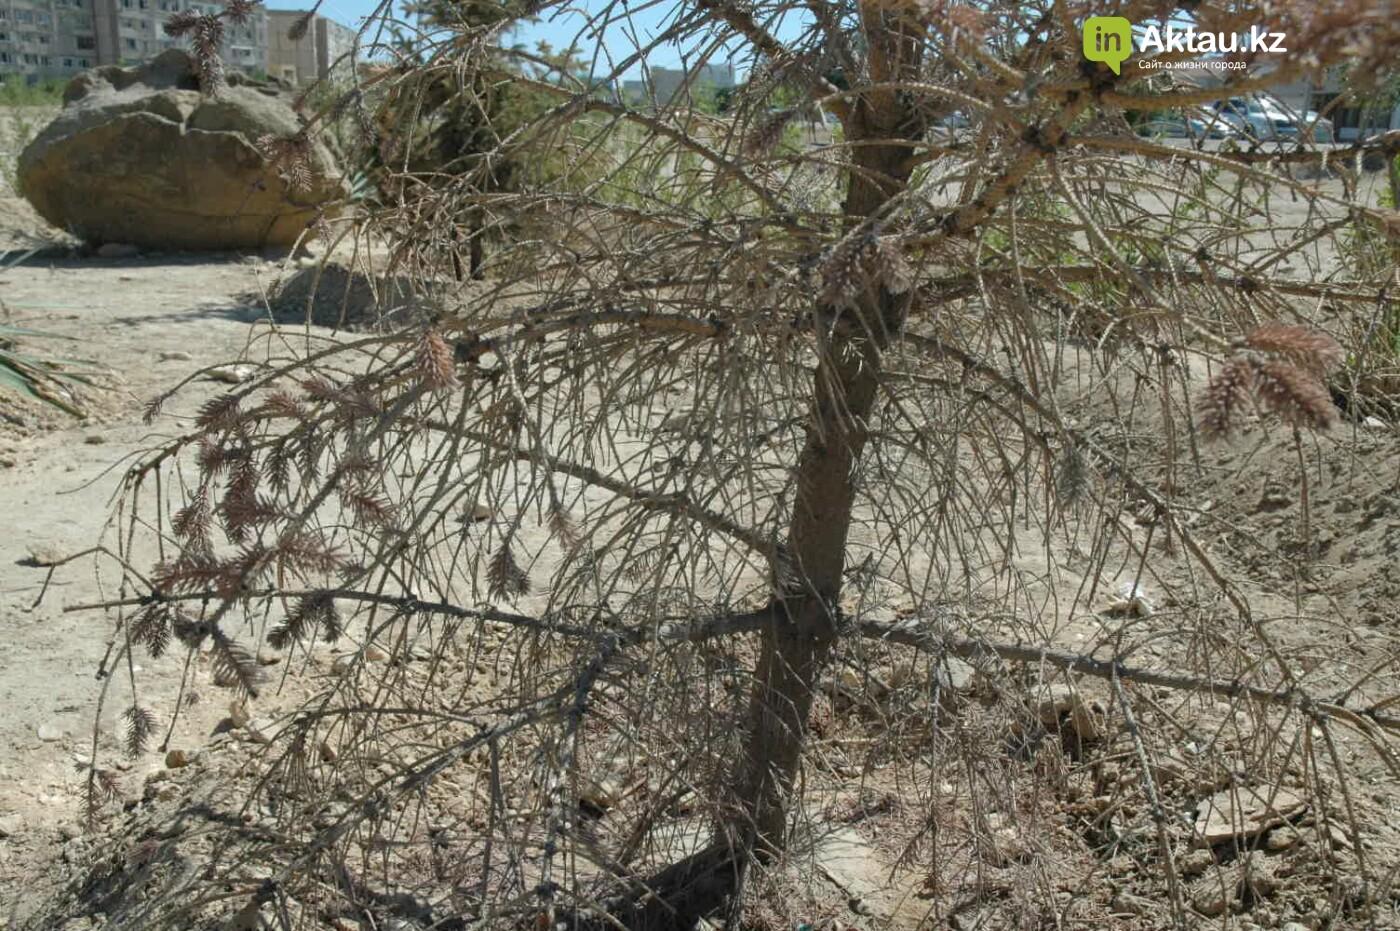 Погибшие от засухи и обезвоживания в Актау исчисляются десятками (ФОТО), фото-33